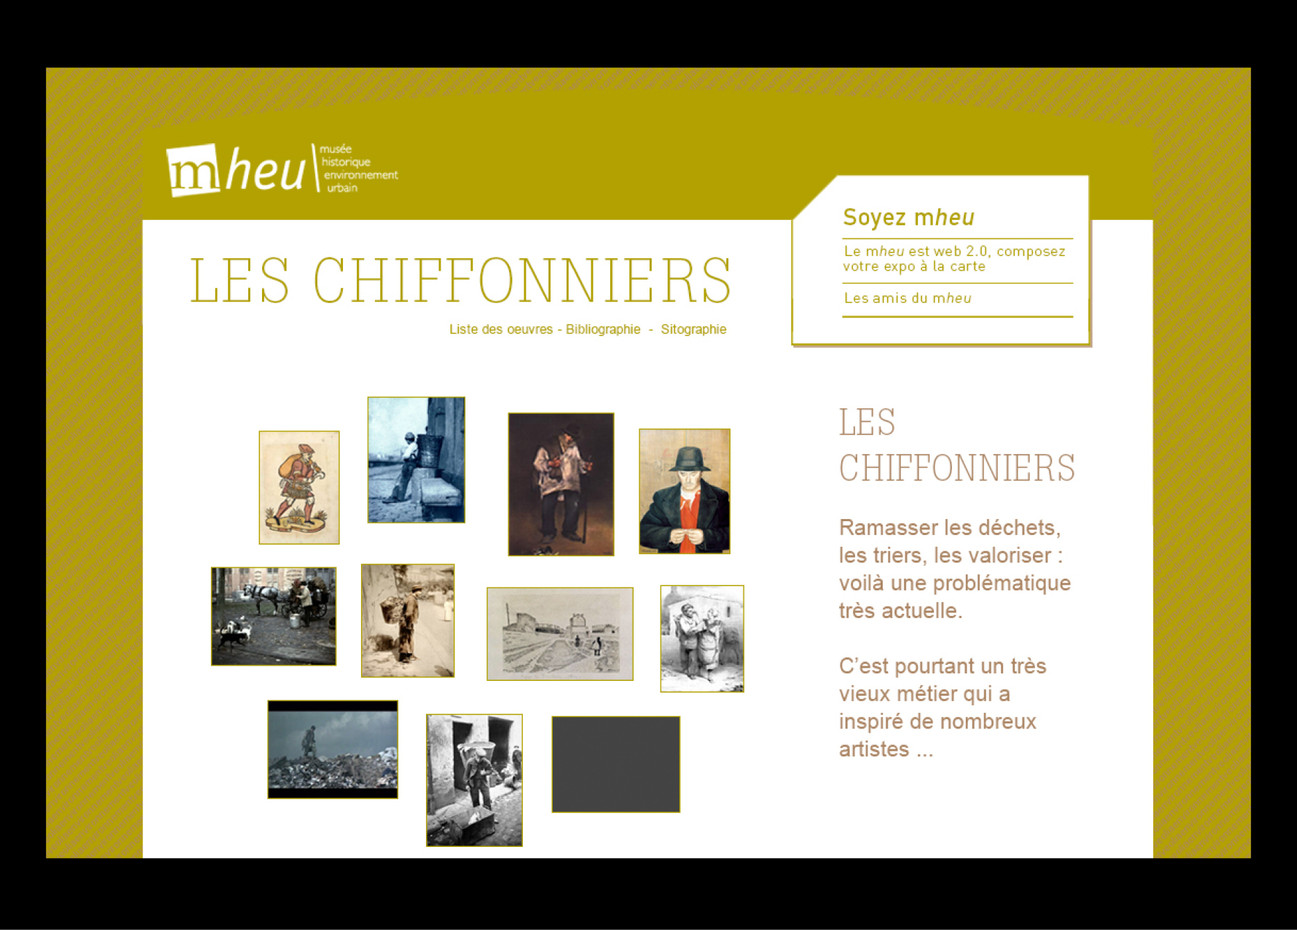 LE MHEU - LES CHIFFONNIERS by VEOLIA